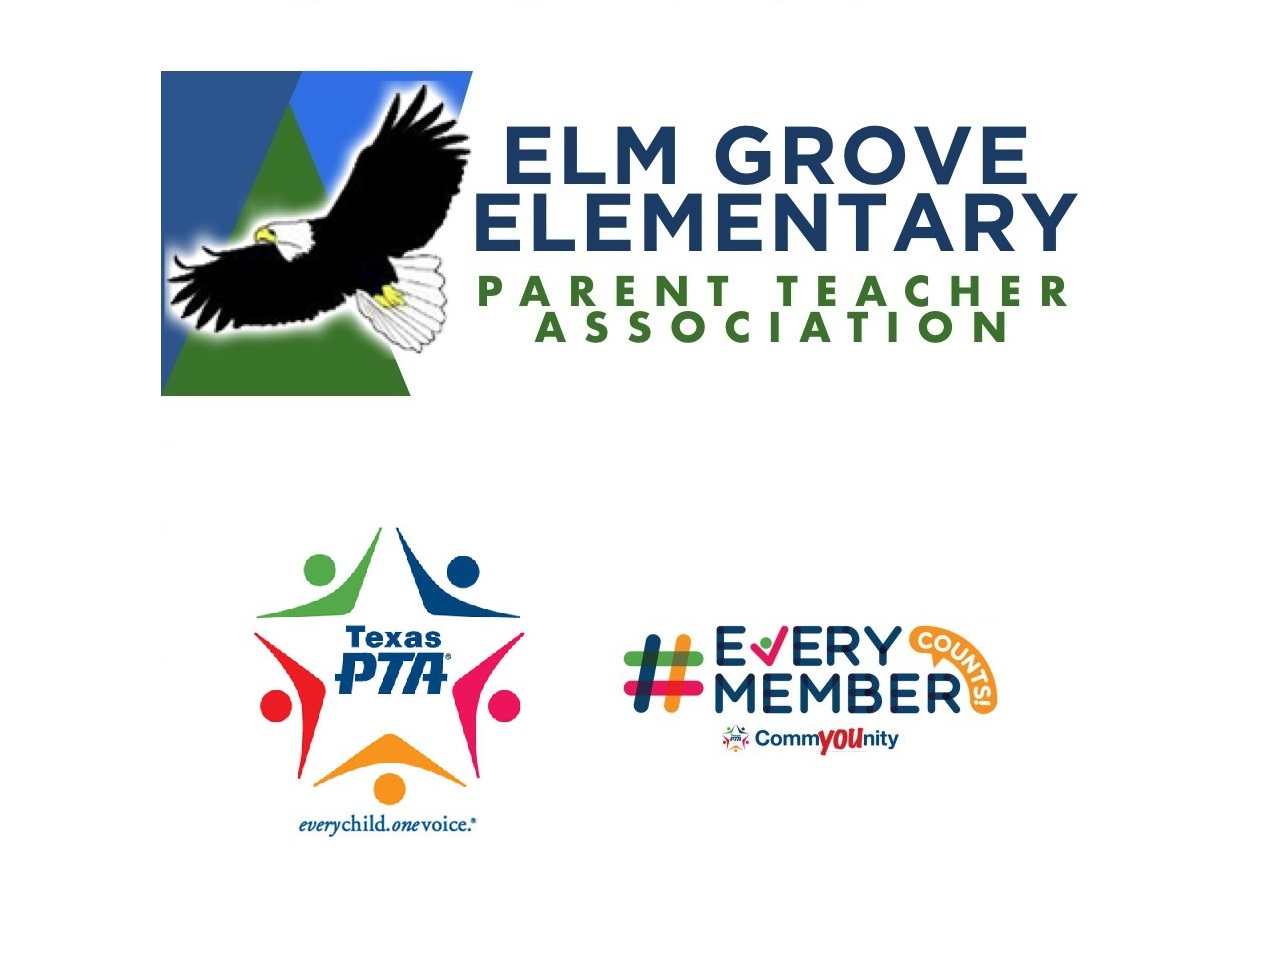 Elm Grove Elementary PTA